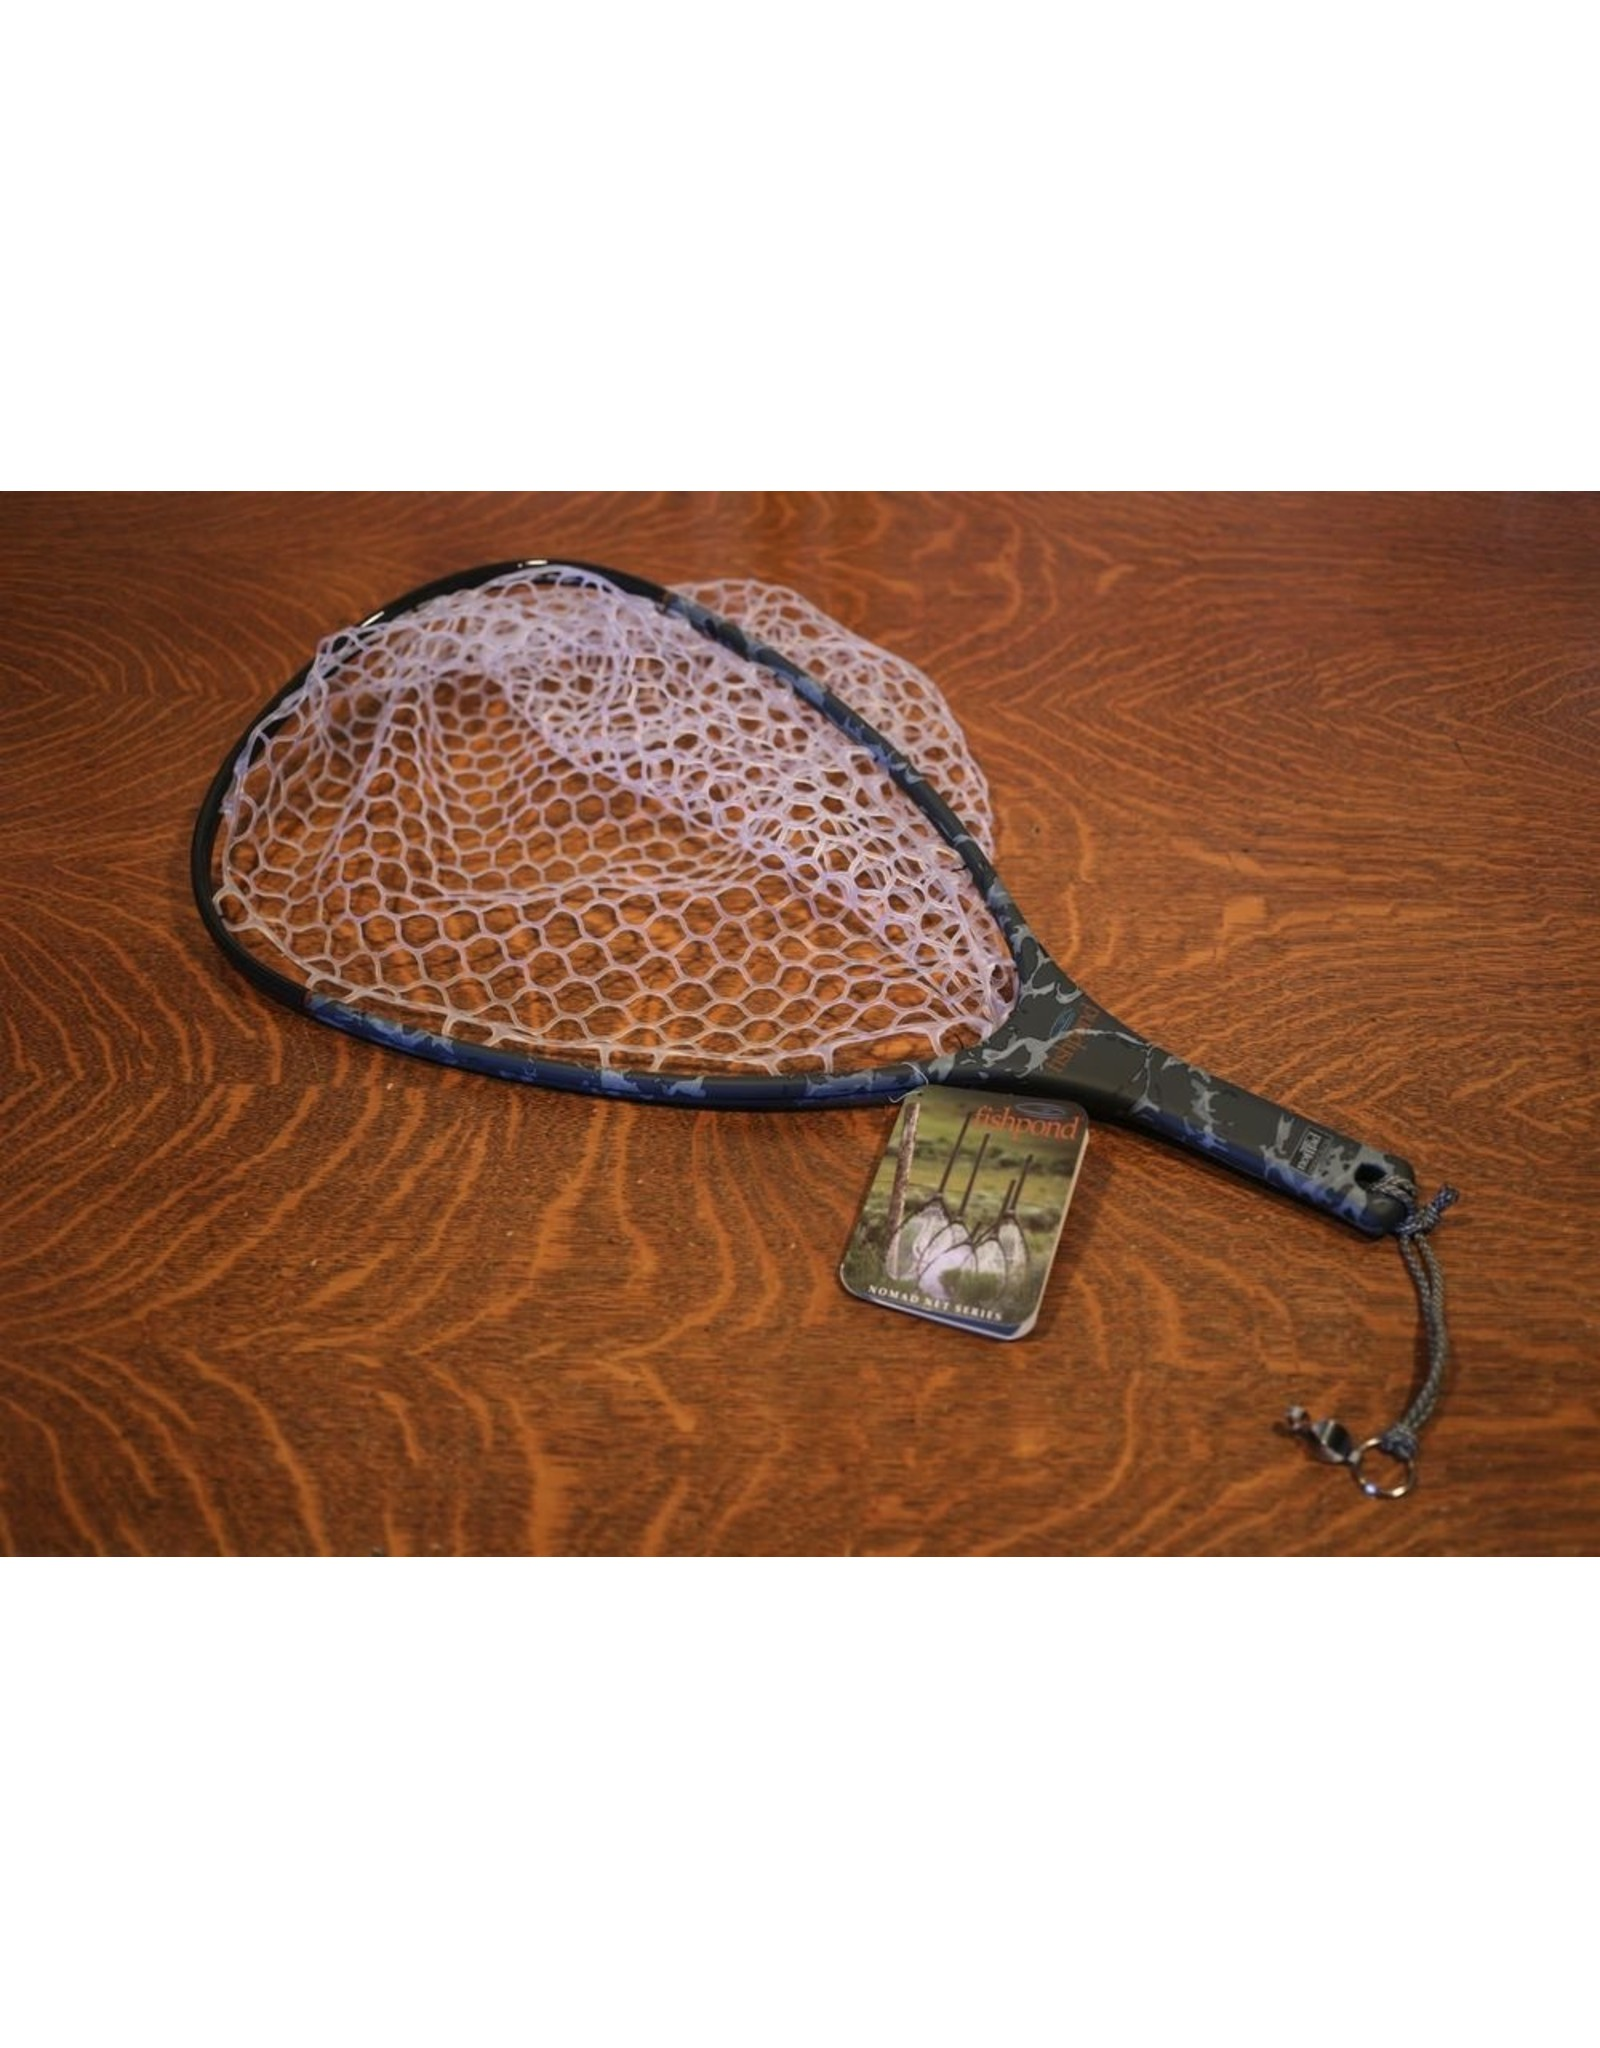 Fishpond Fishpond Nomad Hand Net Riffle Camo